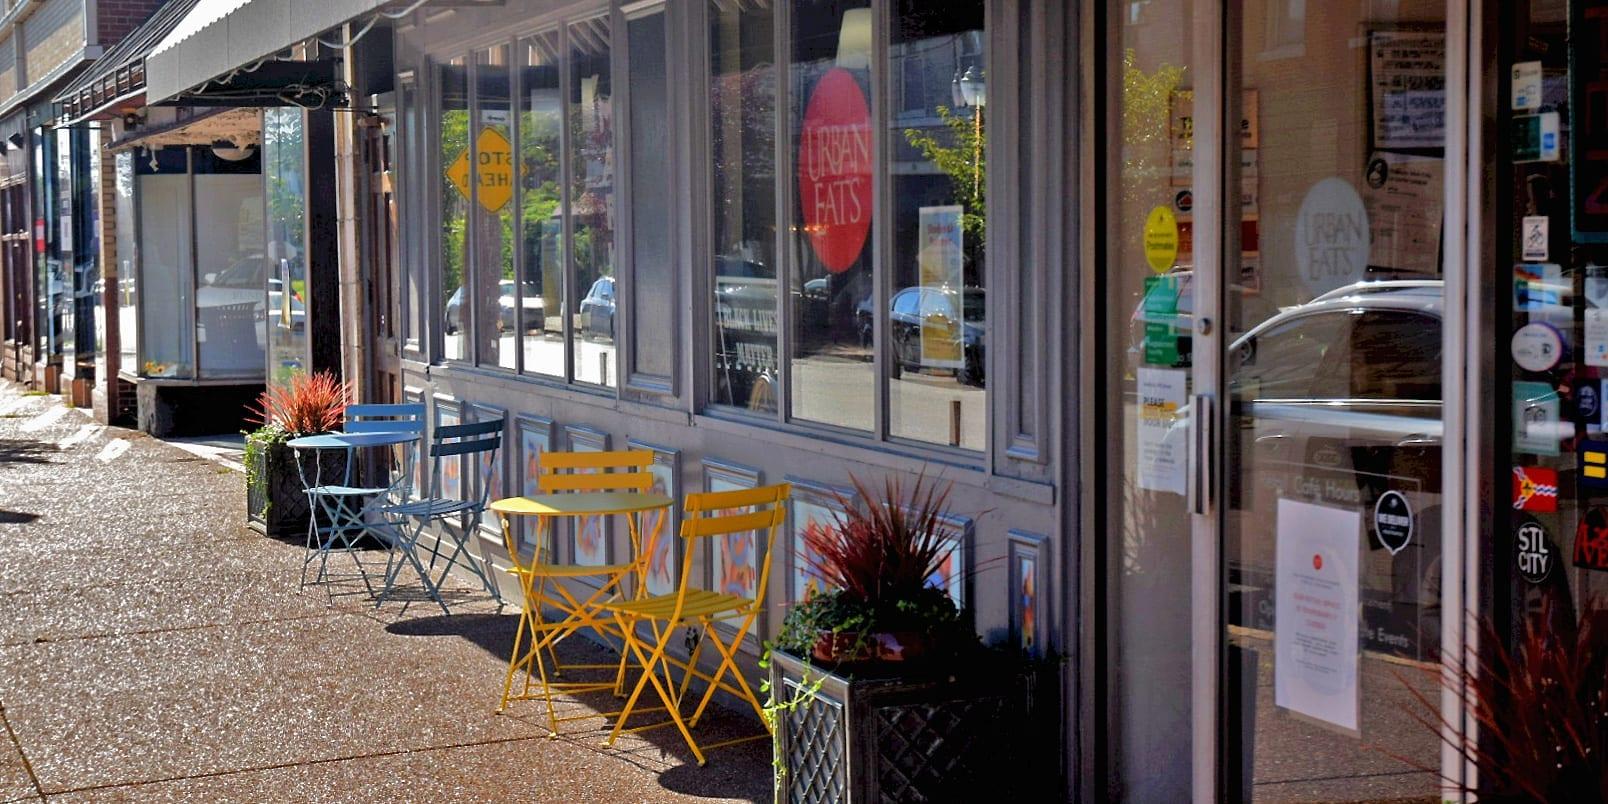 New sidewalk furniture in front of Urban Eats on Meramec Street in Downtown Dutchtown.